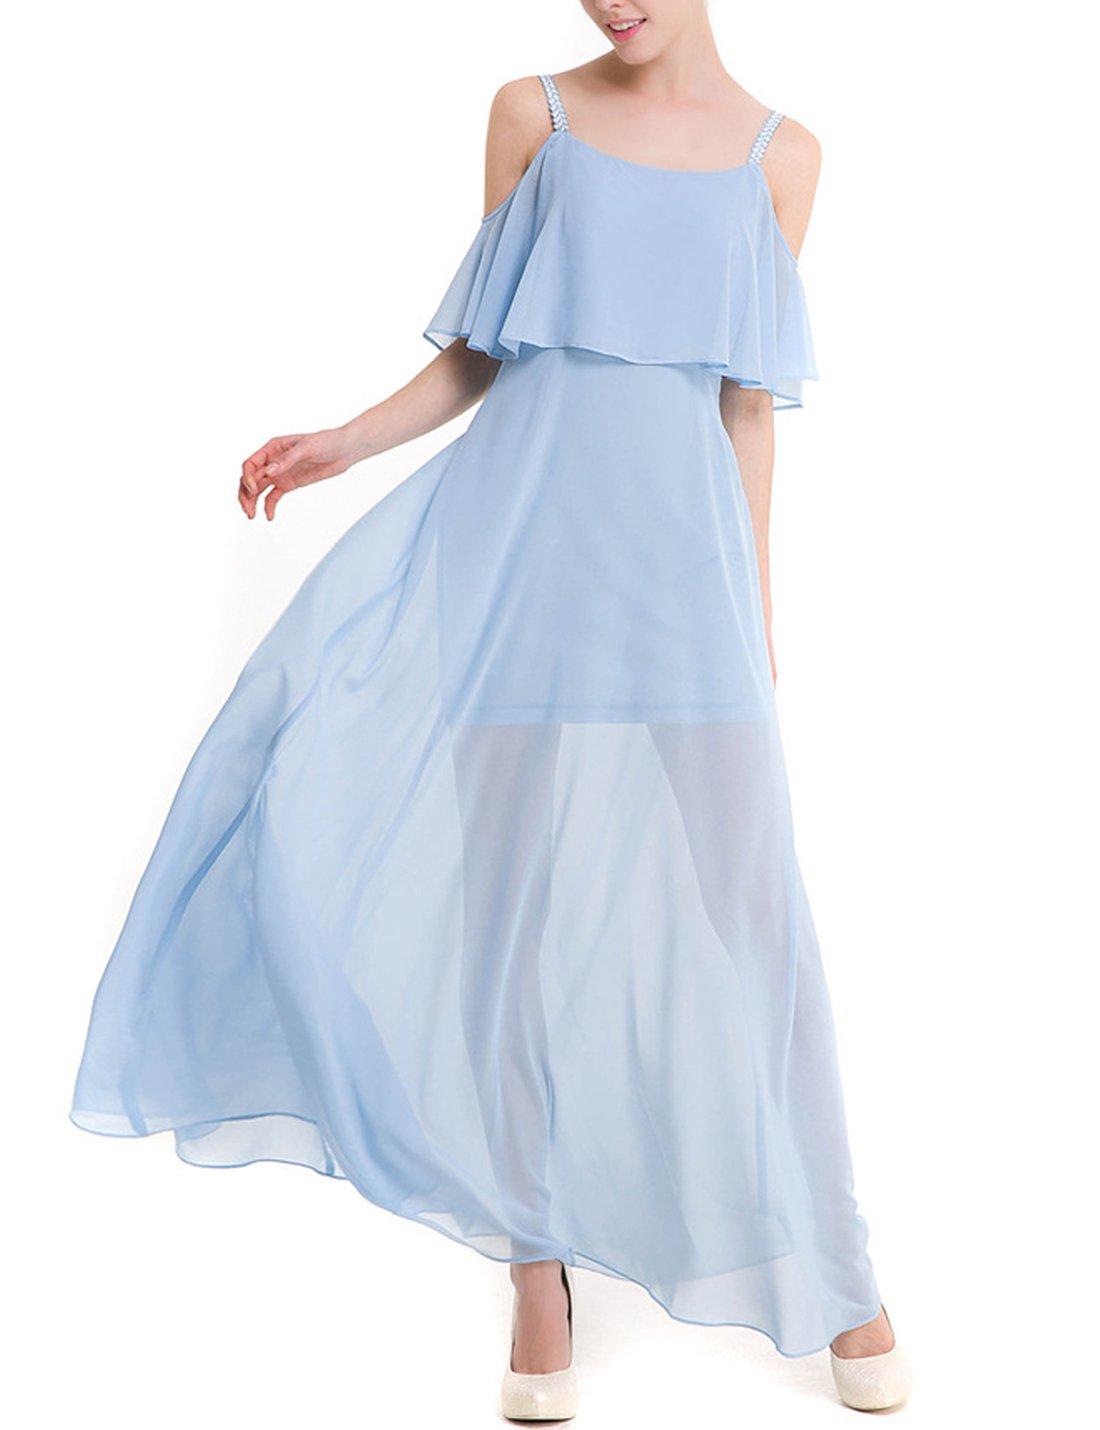 Available at Amazon: Tanming Women's Cold Shoulder Spaghetti Strap Long Chiffon Dress Sundress